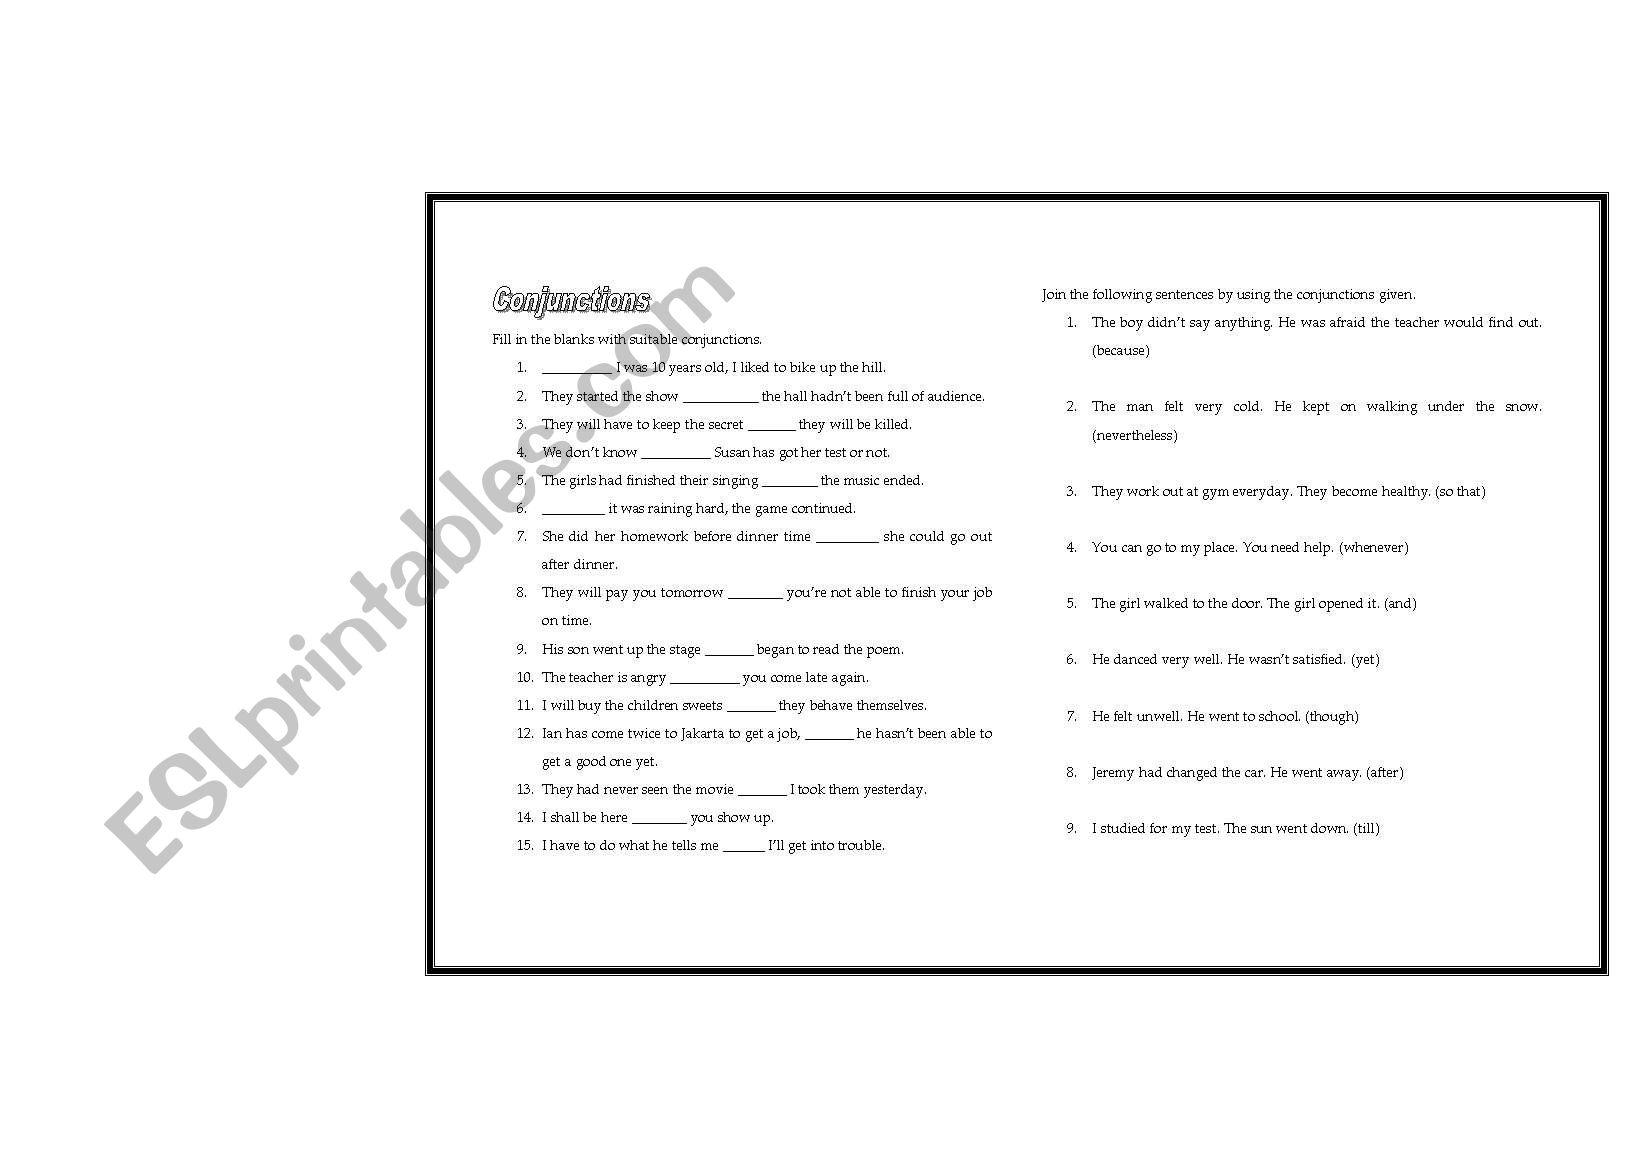 50 Advance Conjunction Questions